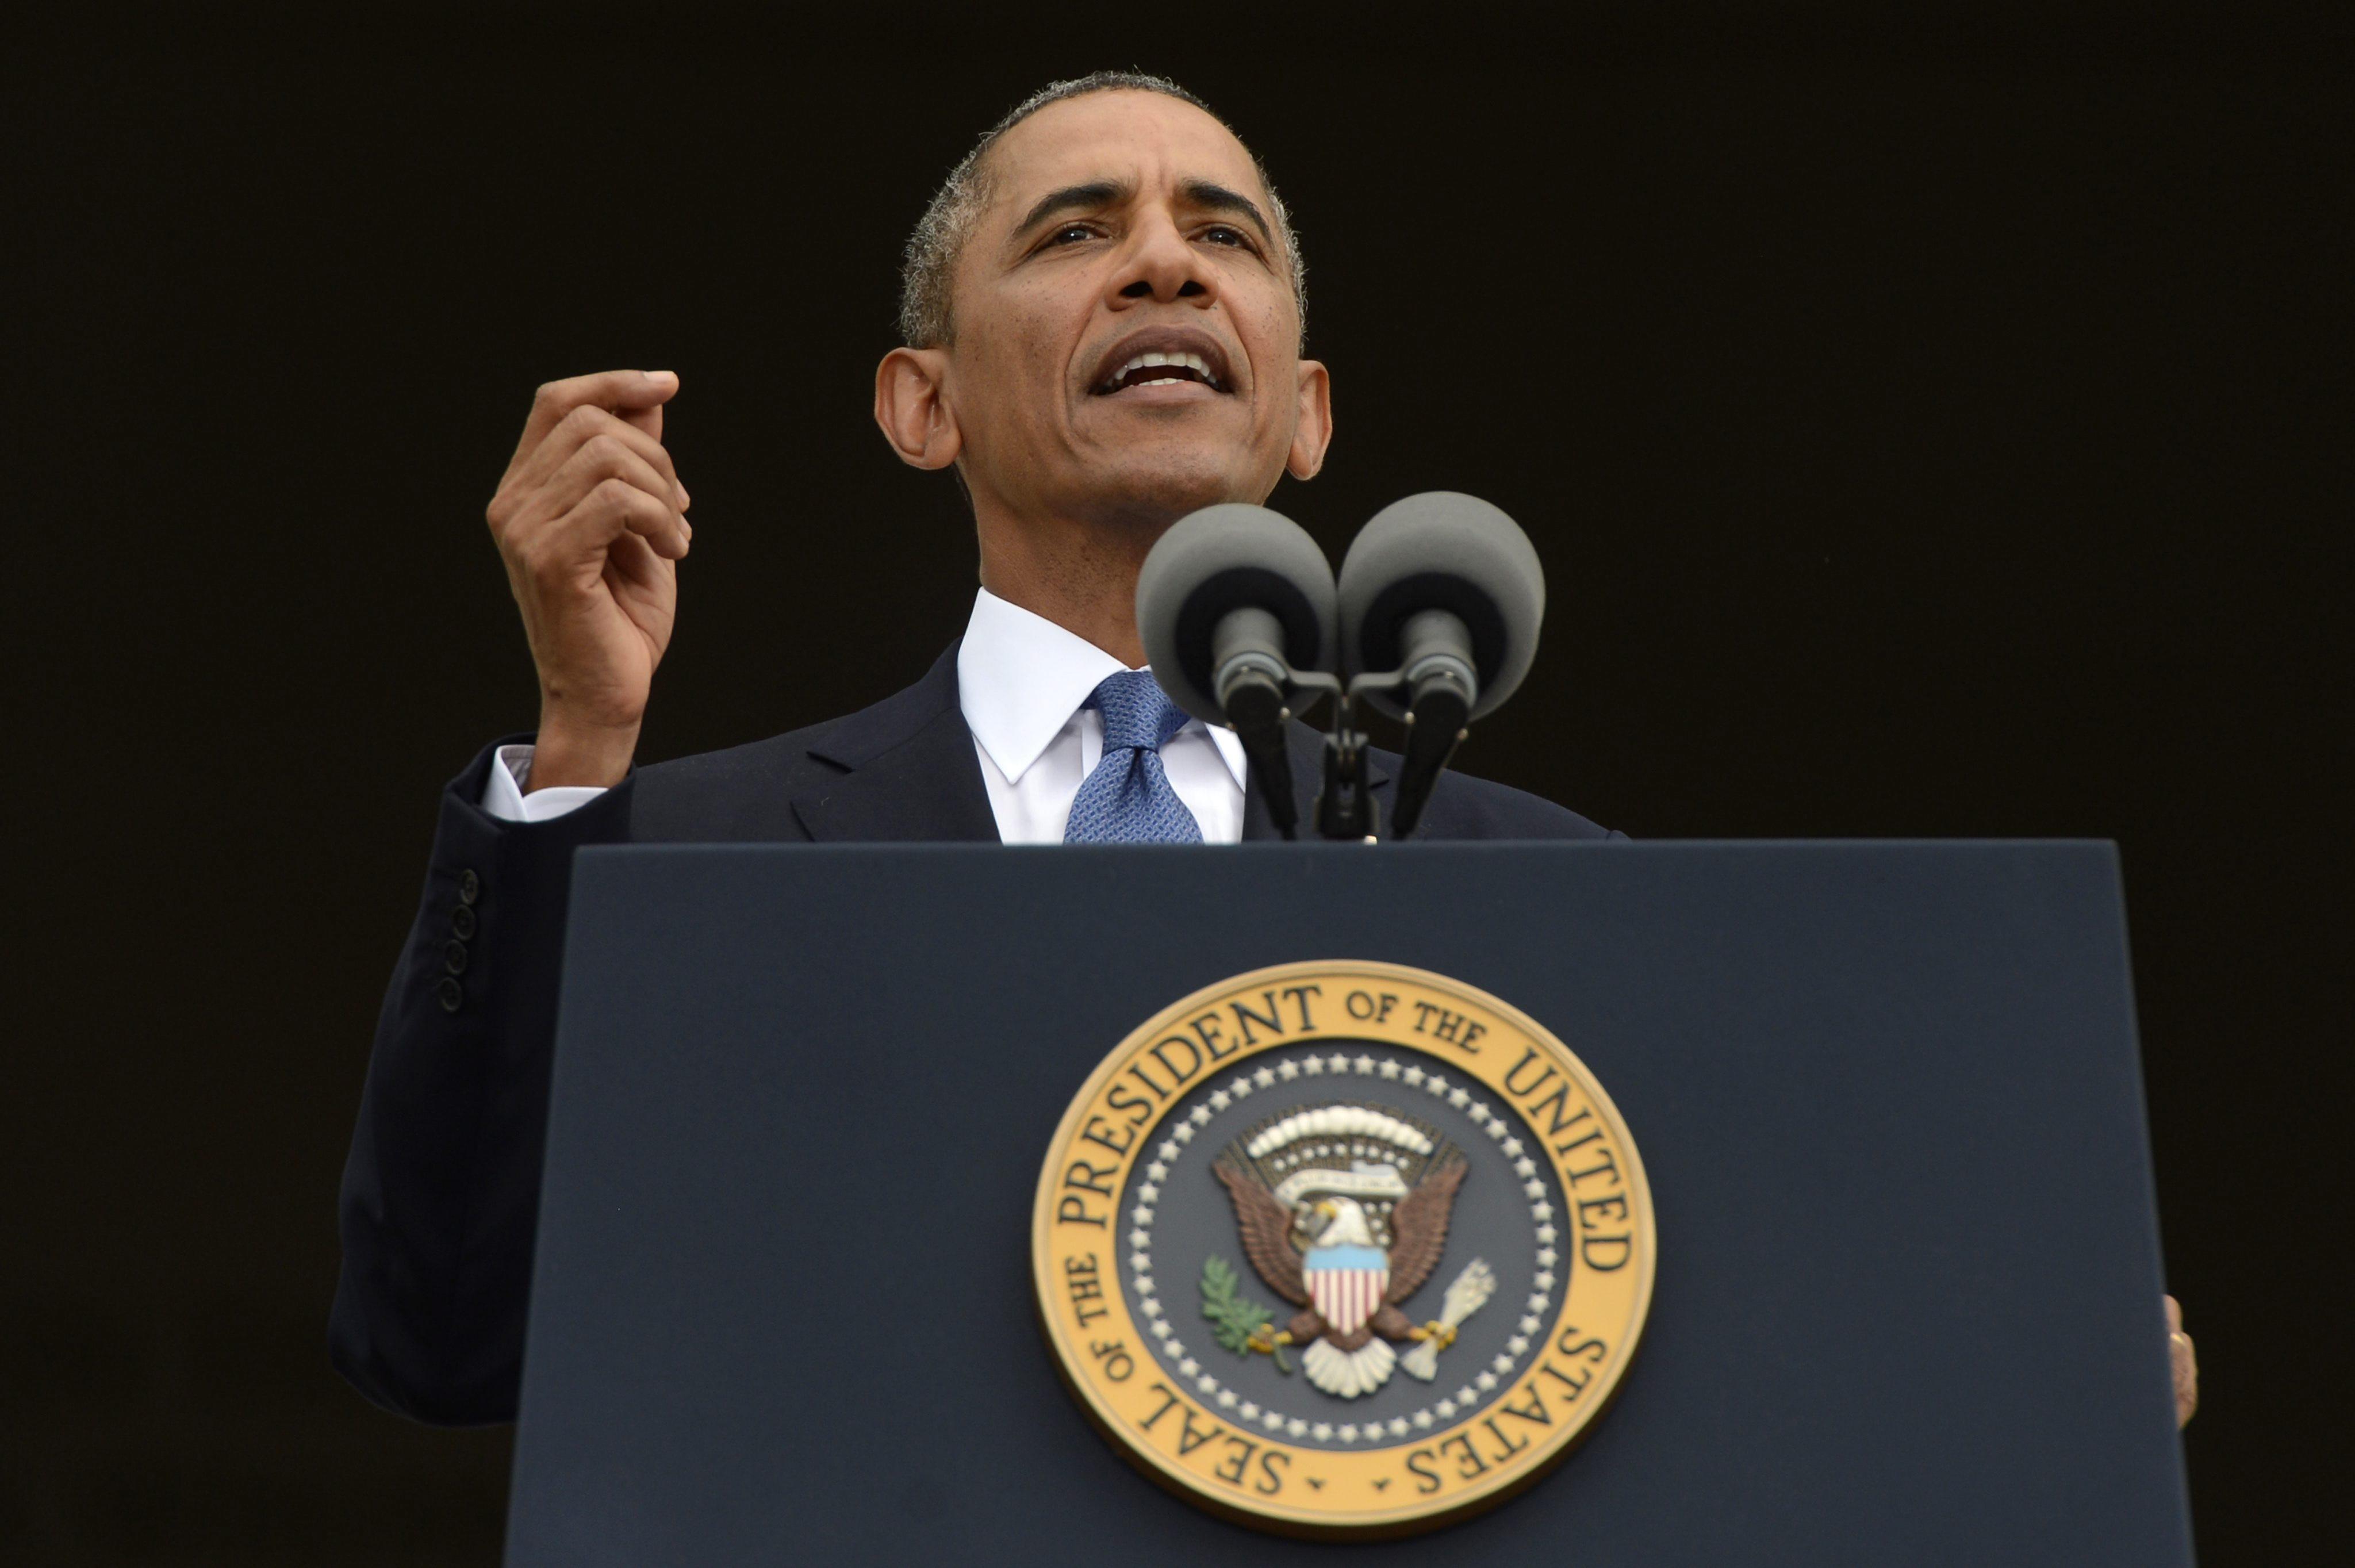 Obama aclara que «todavía» no ha tomado ninguna decisión sobre un eventual ataque contra Siria